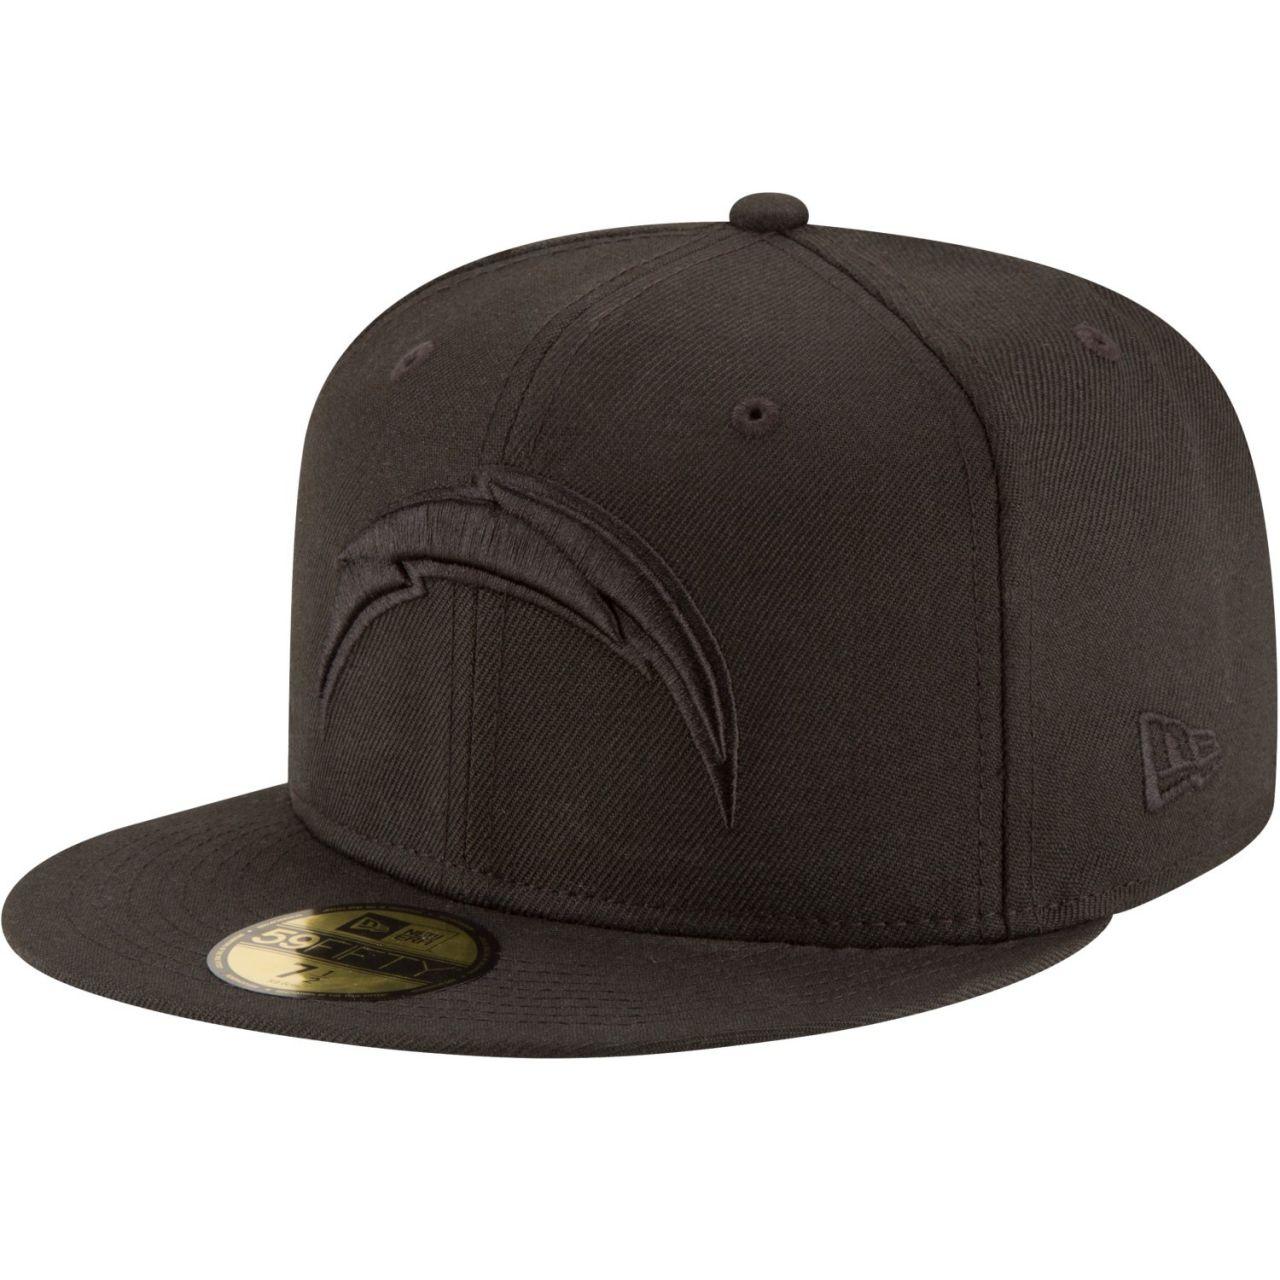 amfoo - New Era 59Fifty Cap - NFL BLACK Los Angeles Chargers